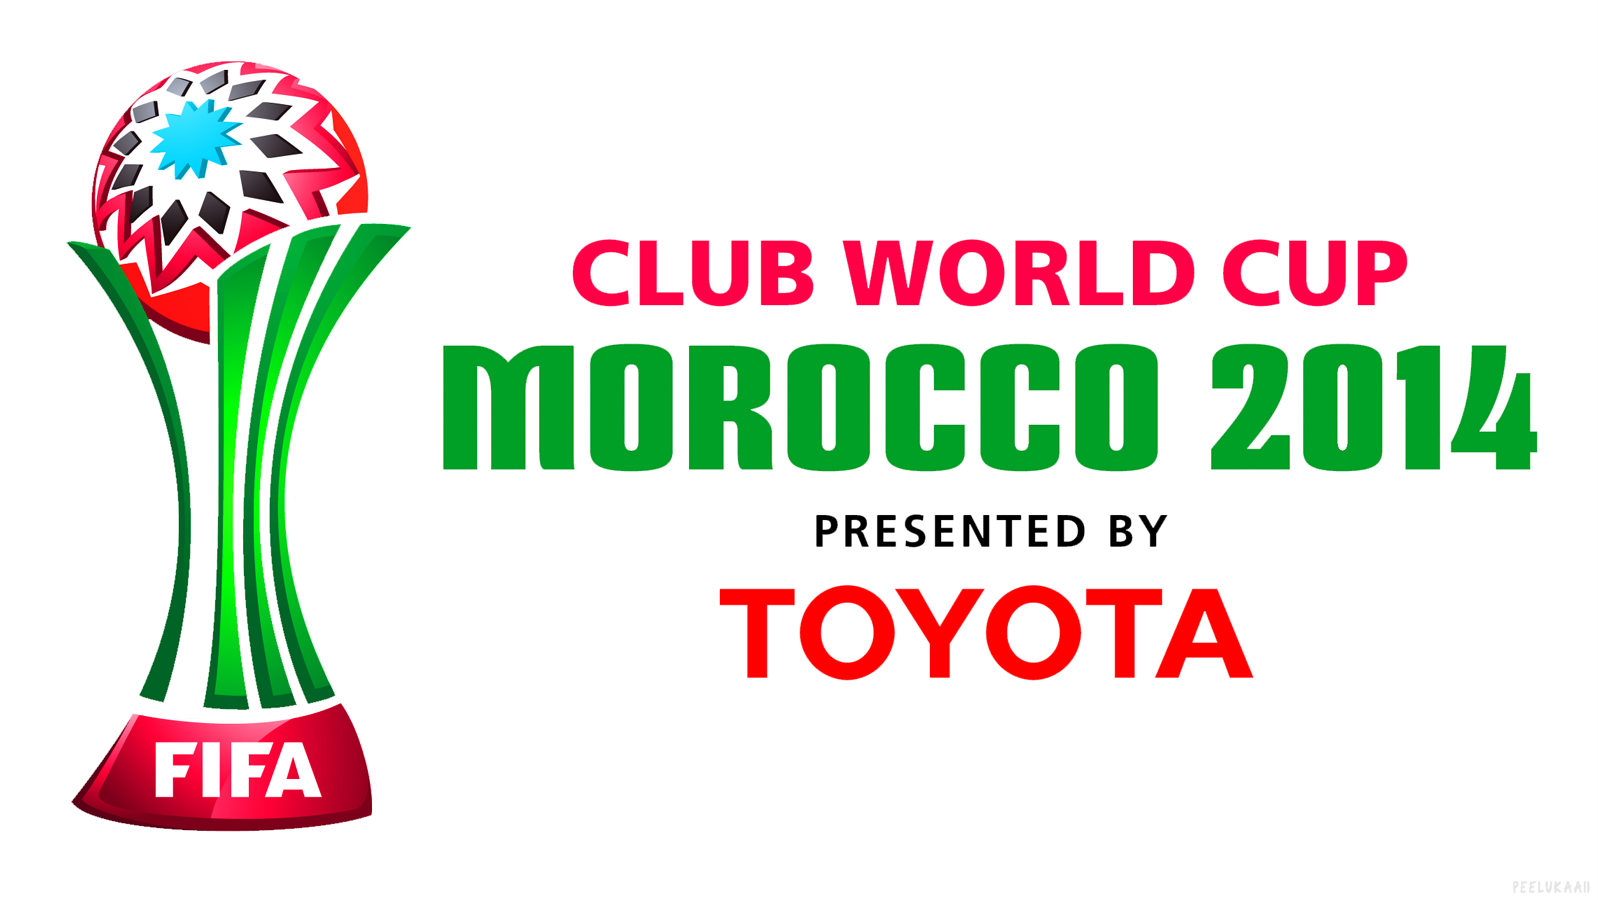 20141217095403-copa-mundial-de-clubes-2014-marruecos-logo.jpg